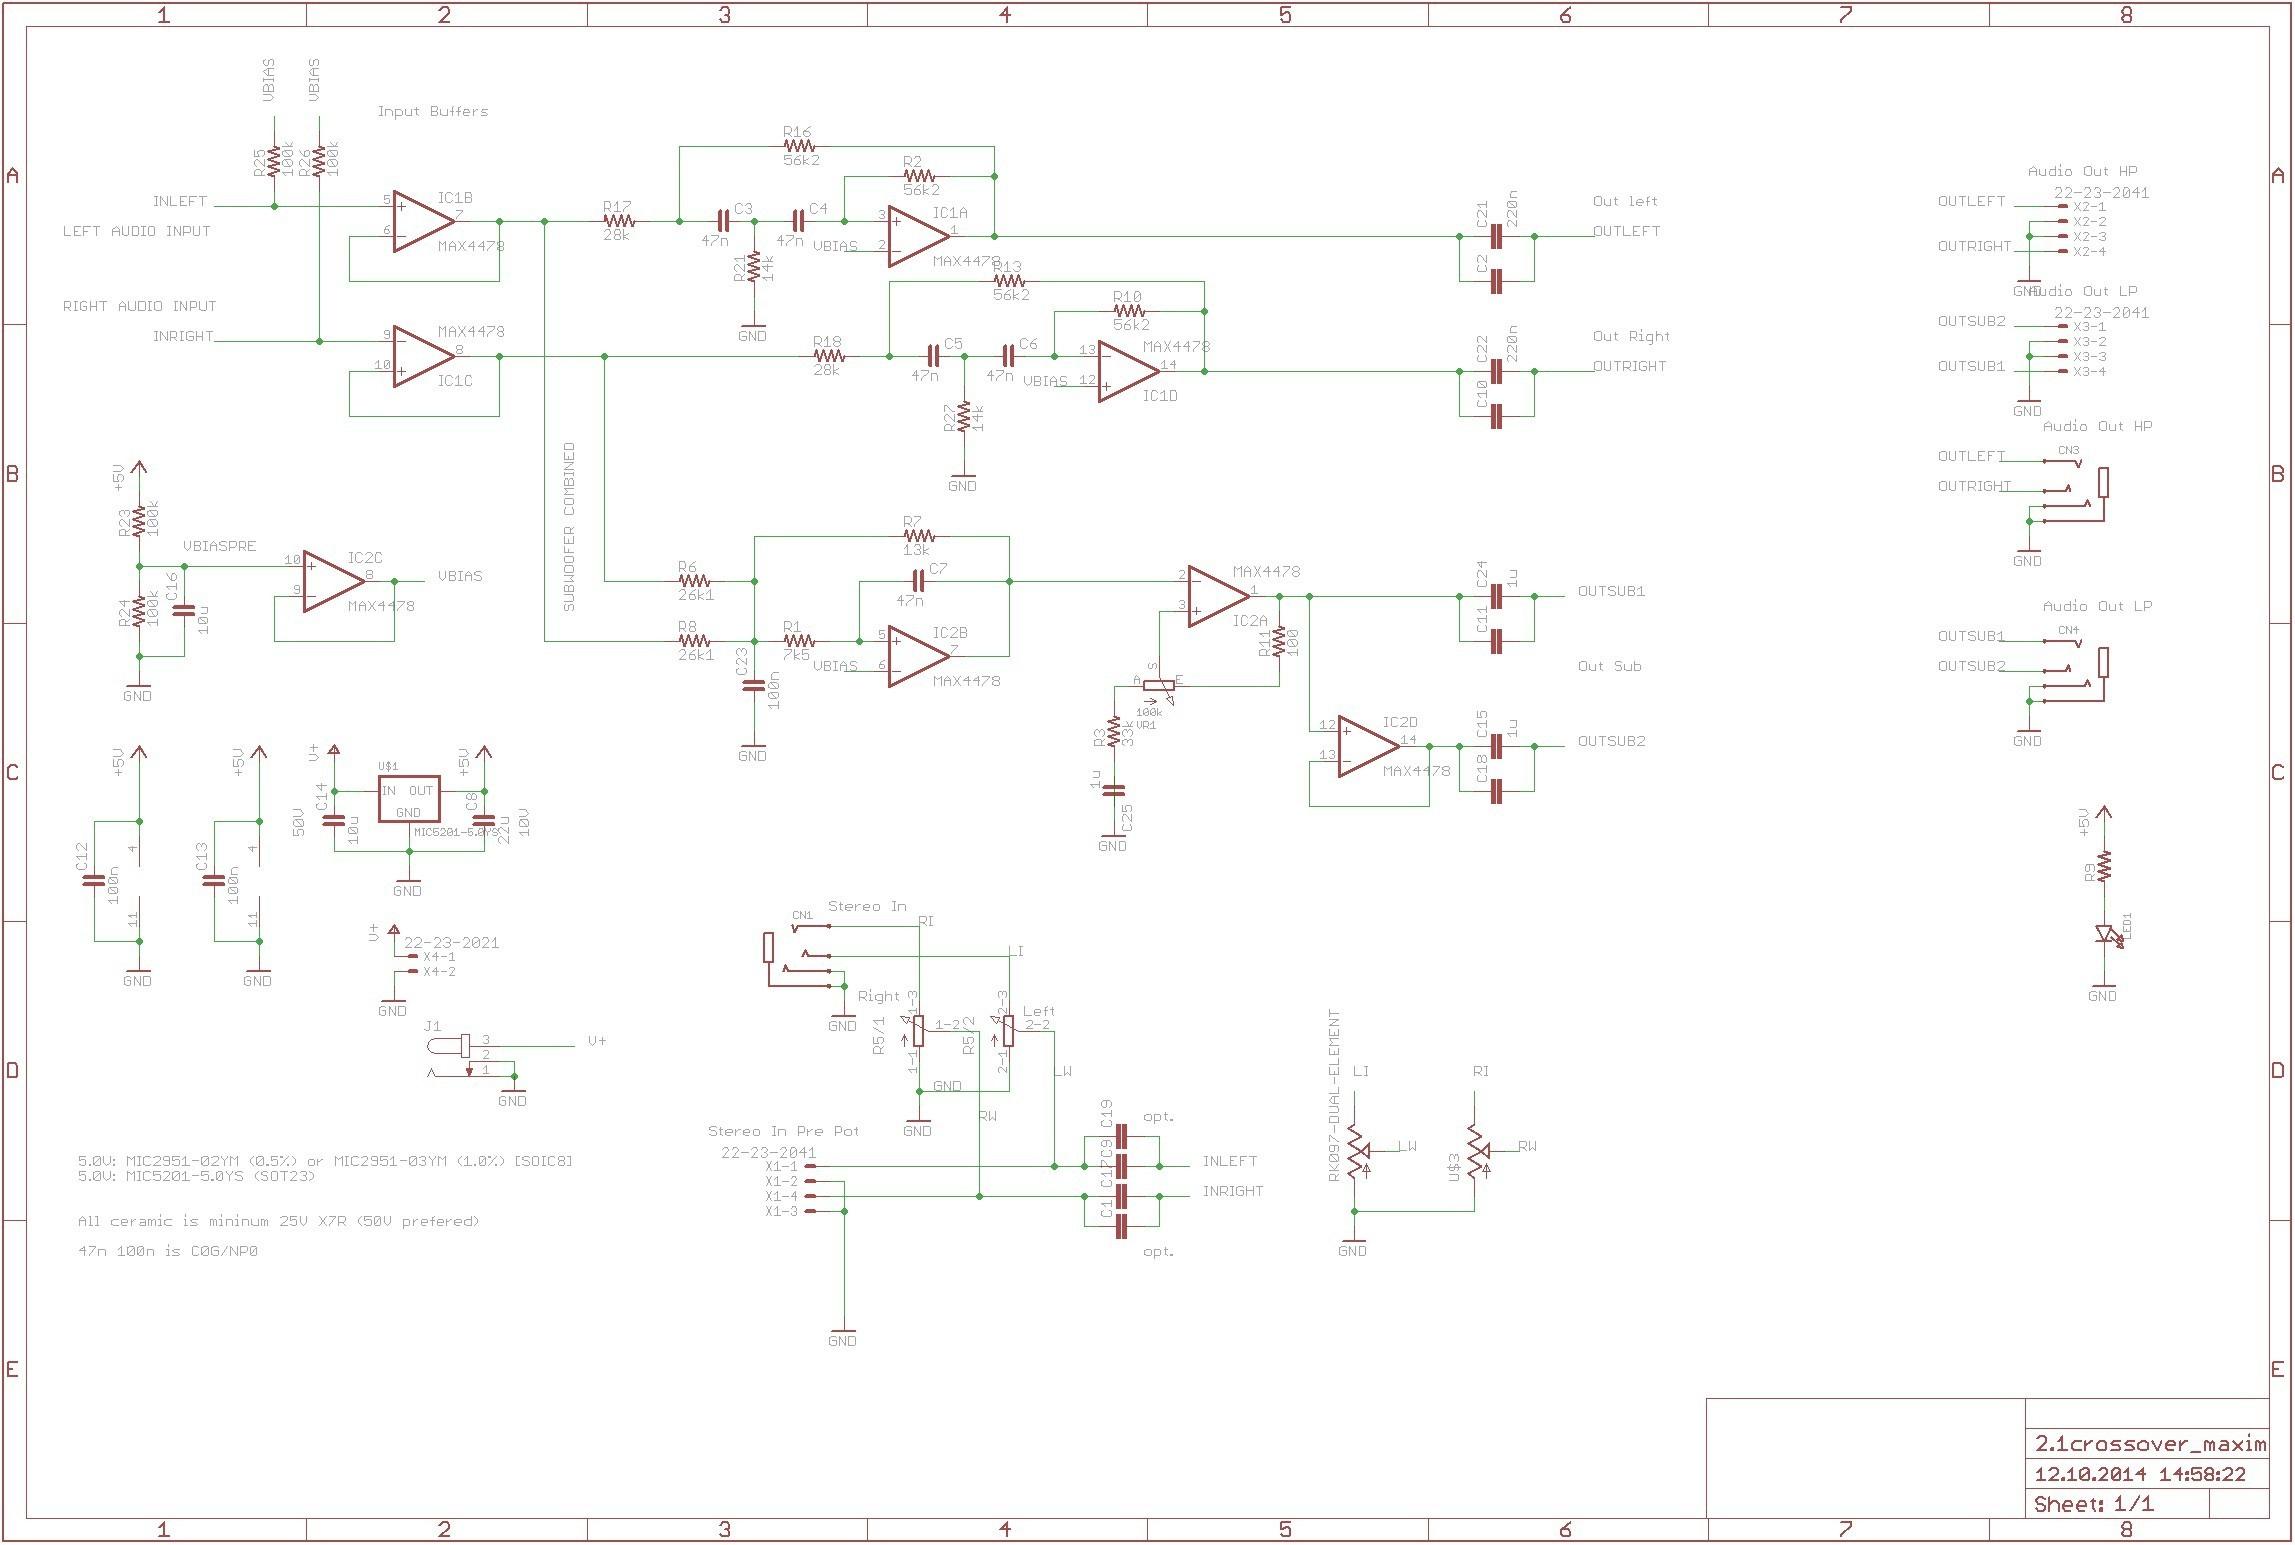 Light Wireing Diagram Wiring Diagram Led Strip Lights New Http Wikidiyfaqorguk 0 0d Of Light Wireing Diagram